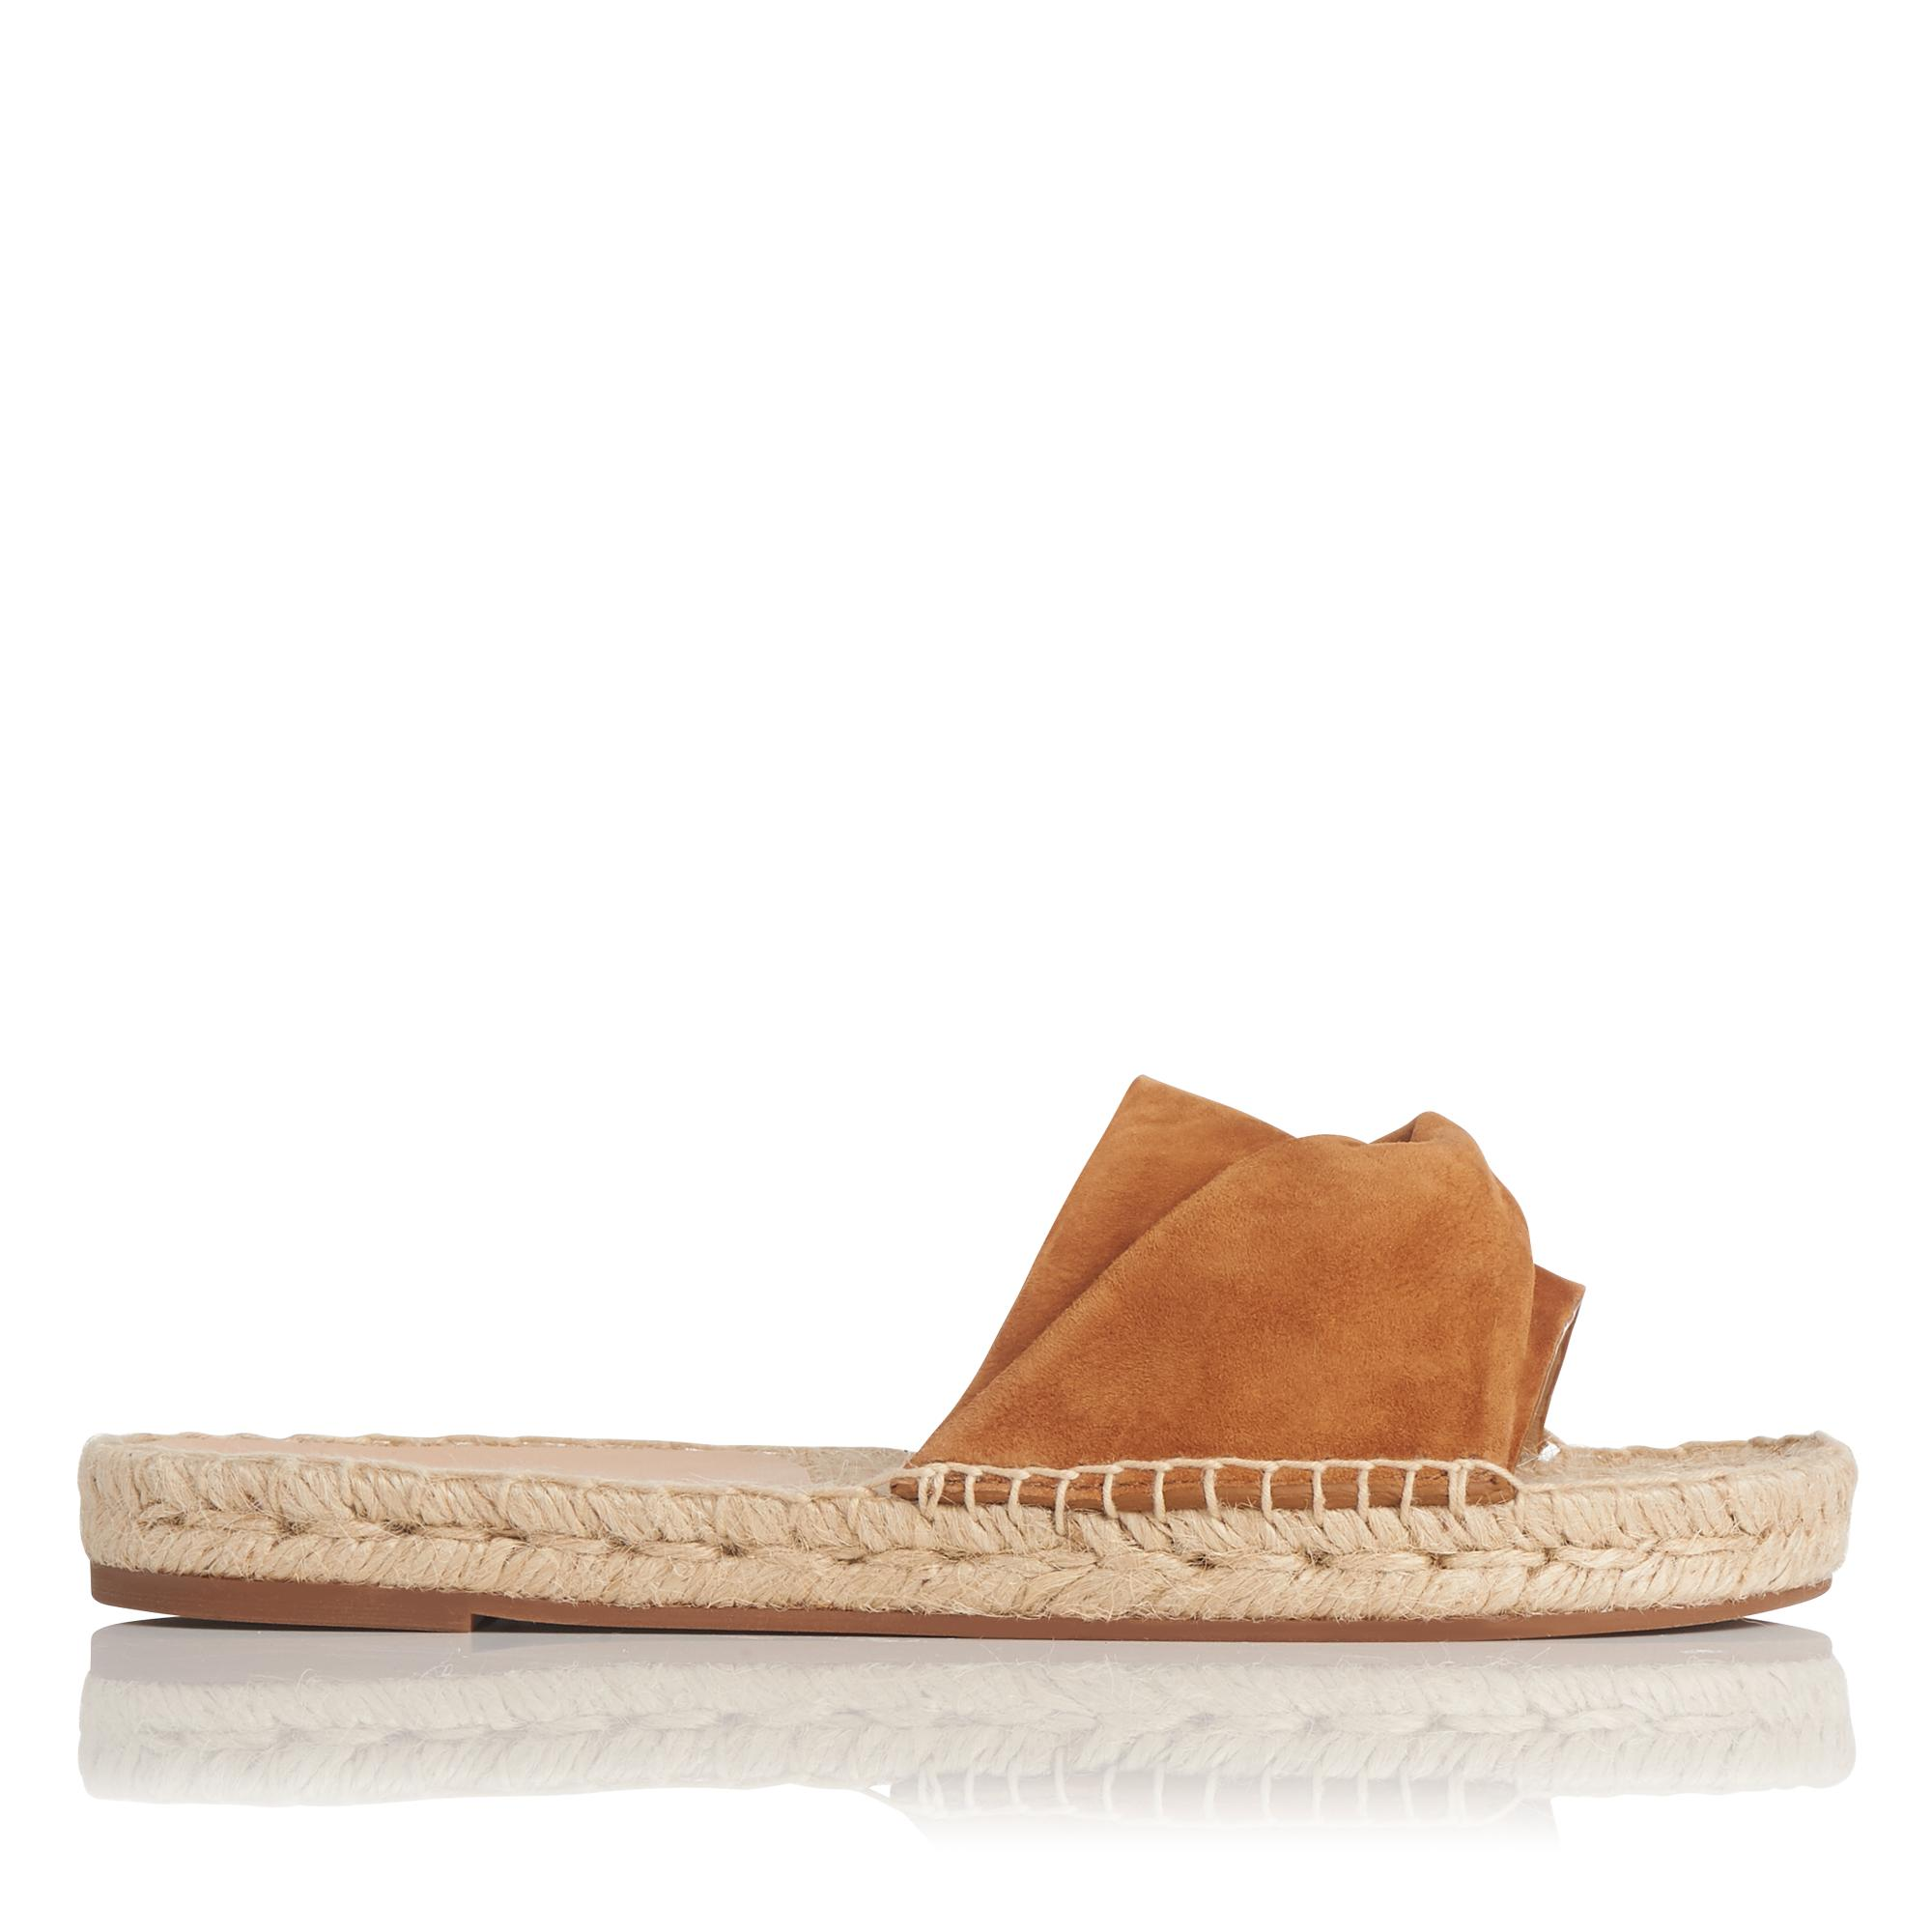 Alena Tan Suede Flat Espadrille Sandals